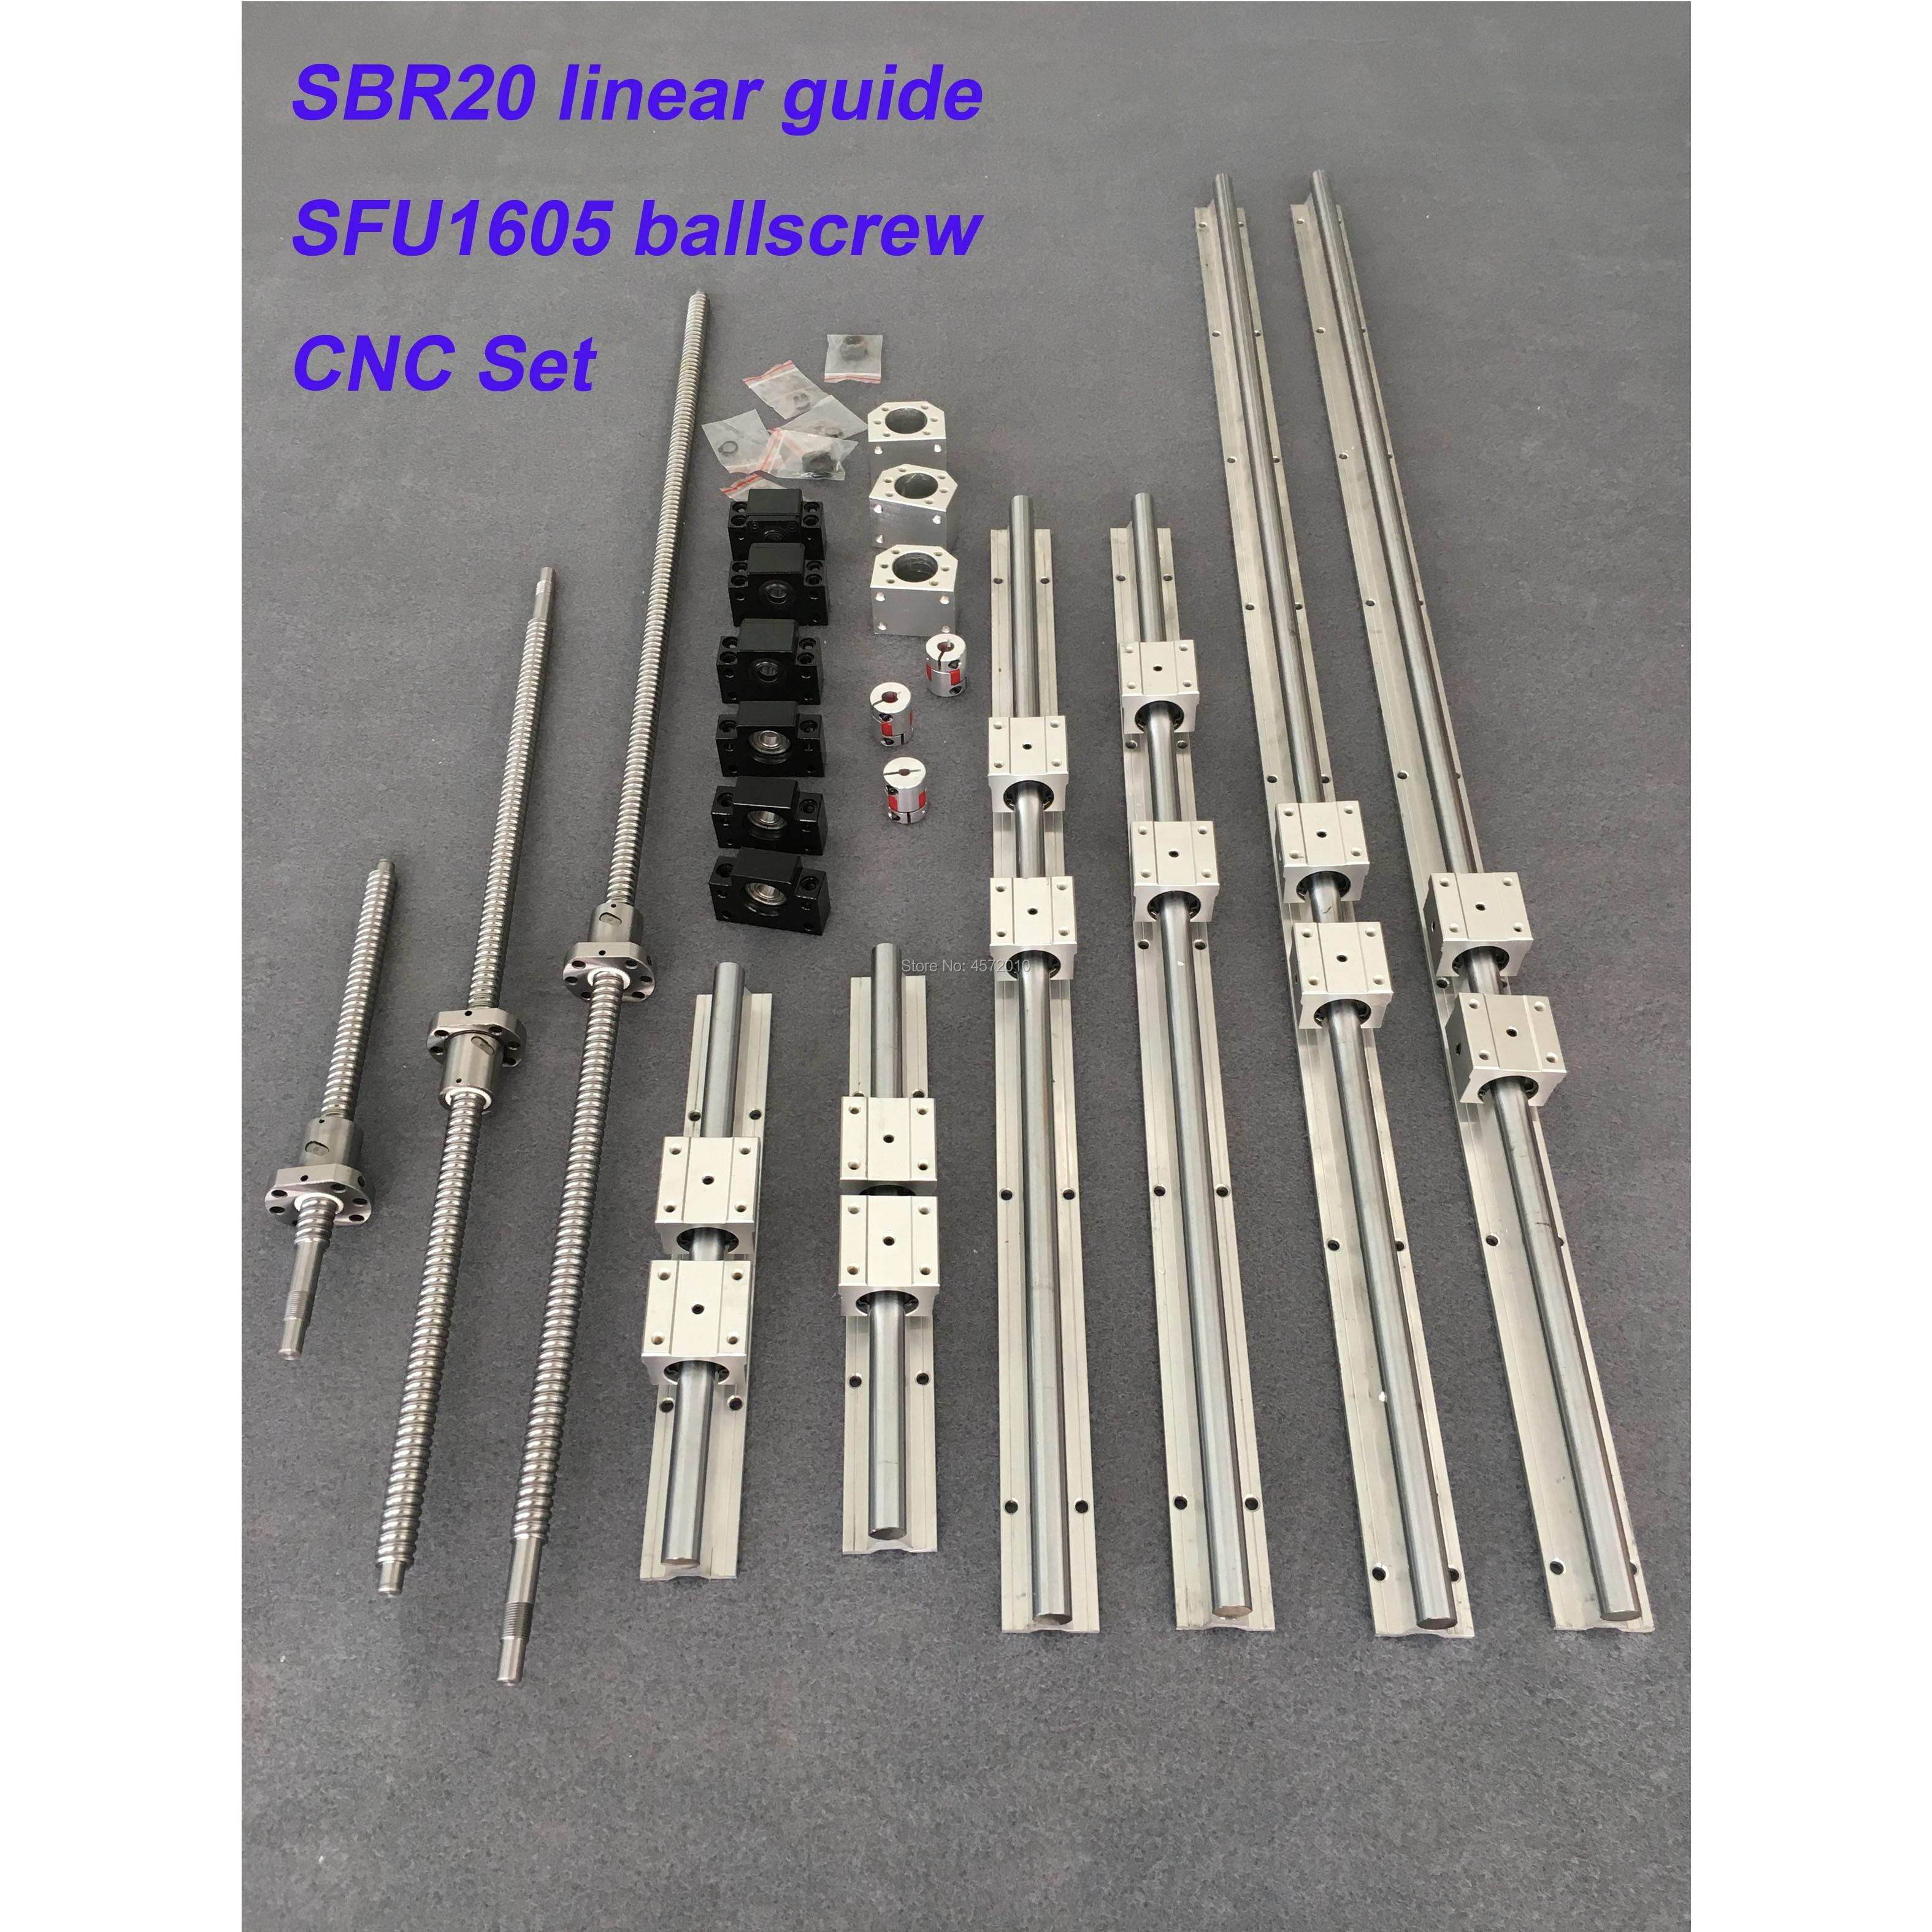 SBR 20 linear guide Rail 6 set SBR20 - 300/600/1000mm + ballscrew set SFU1605 - 350/650/1050mm + BK/BF12 CNC partsSBR 20 linear guide Rail 6 set SBR20 - 300/600/1000mm + ballscrew set SFU1605 - 350/650/1050mm + BK/BF12 CNC parts